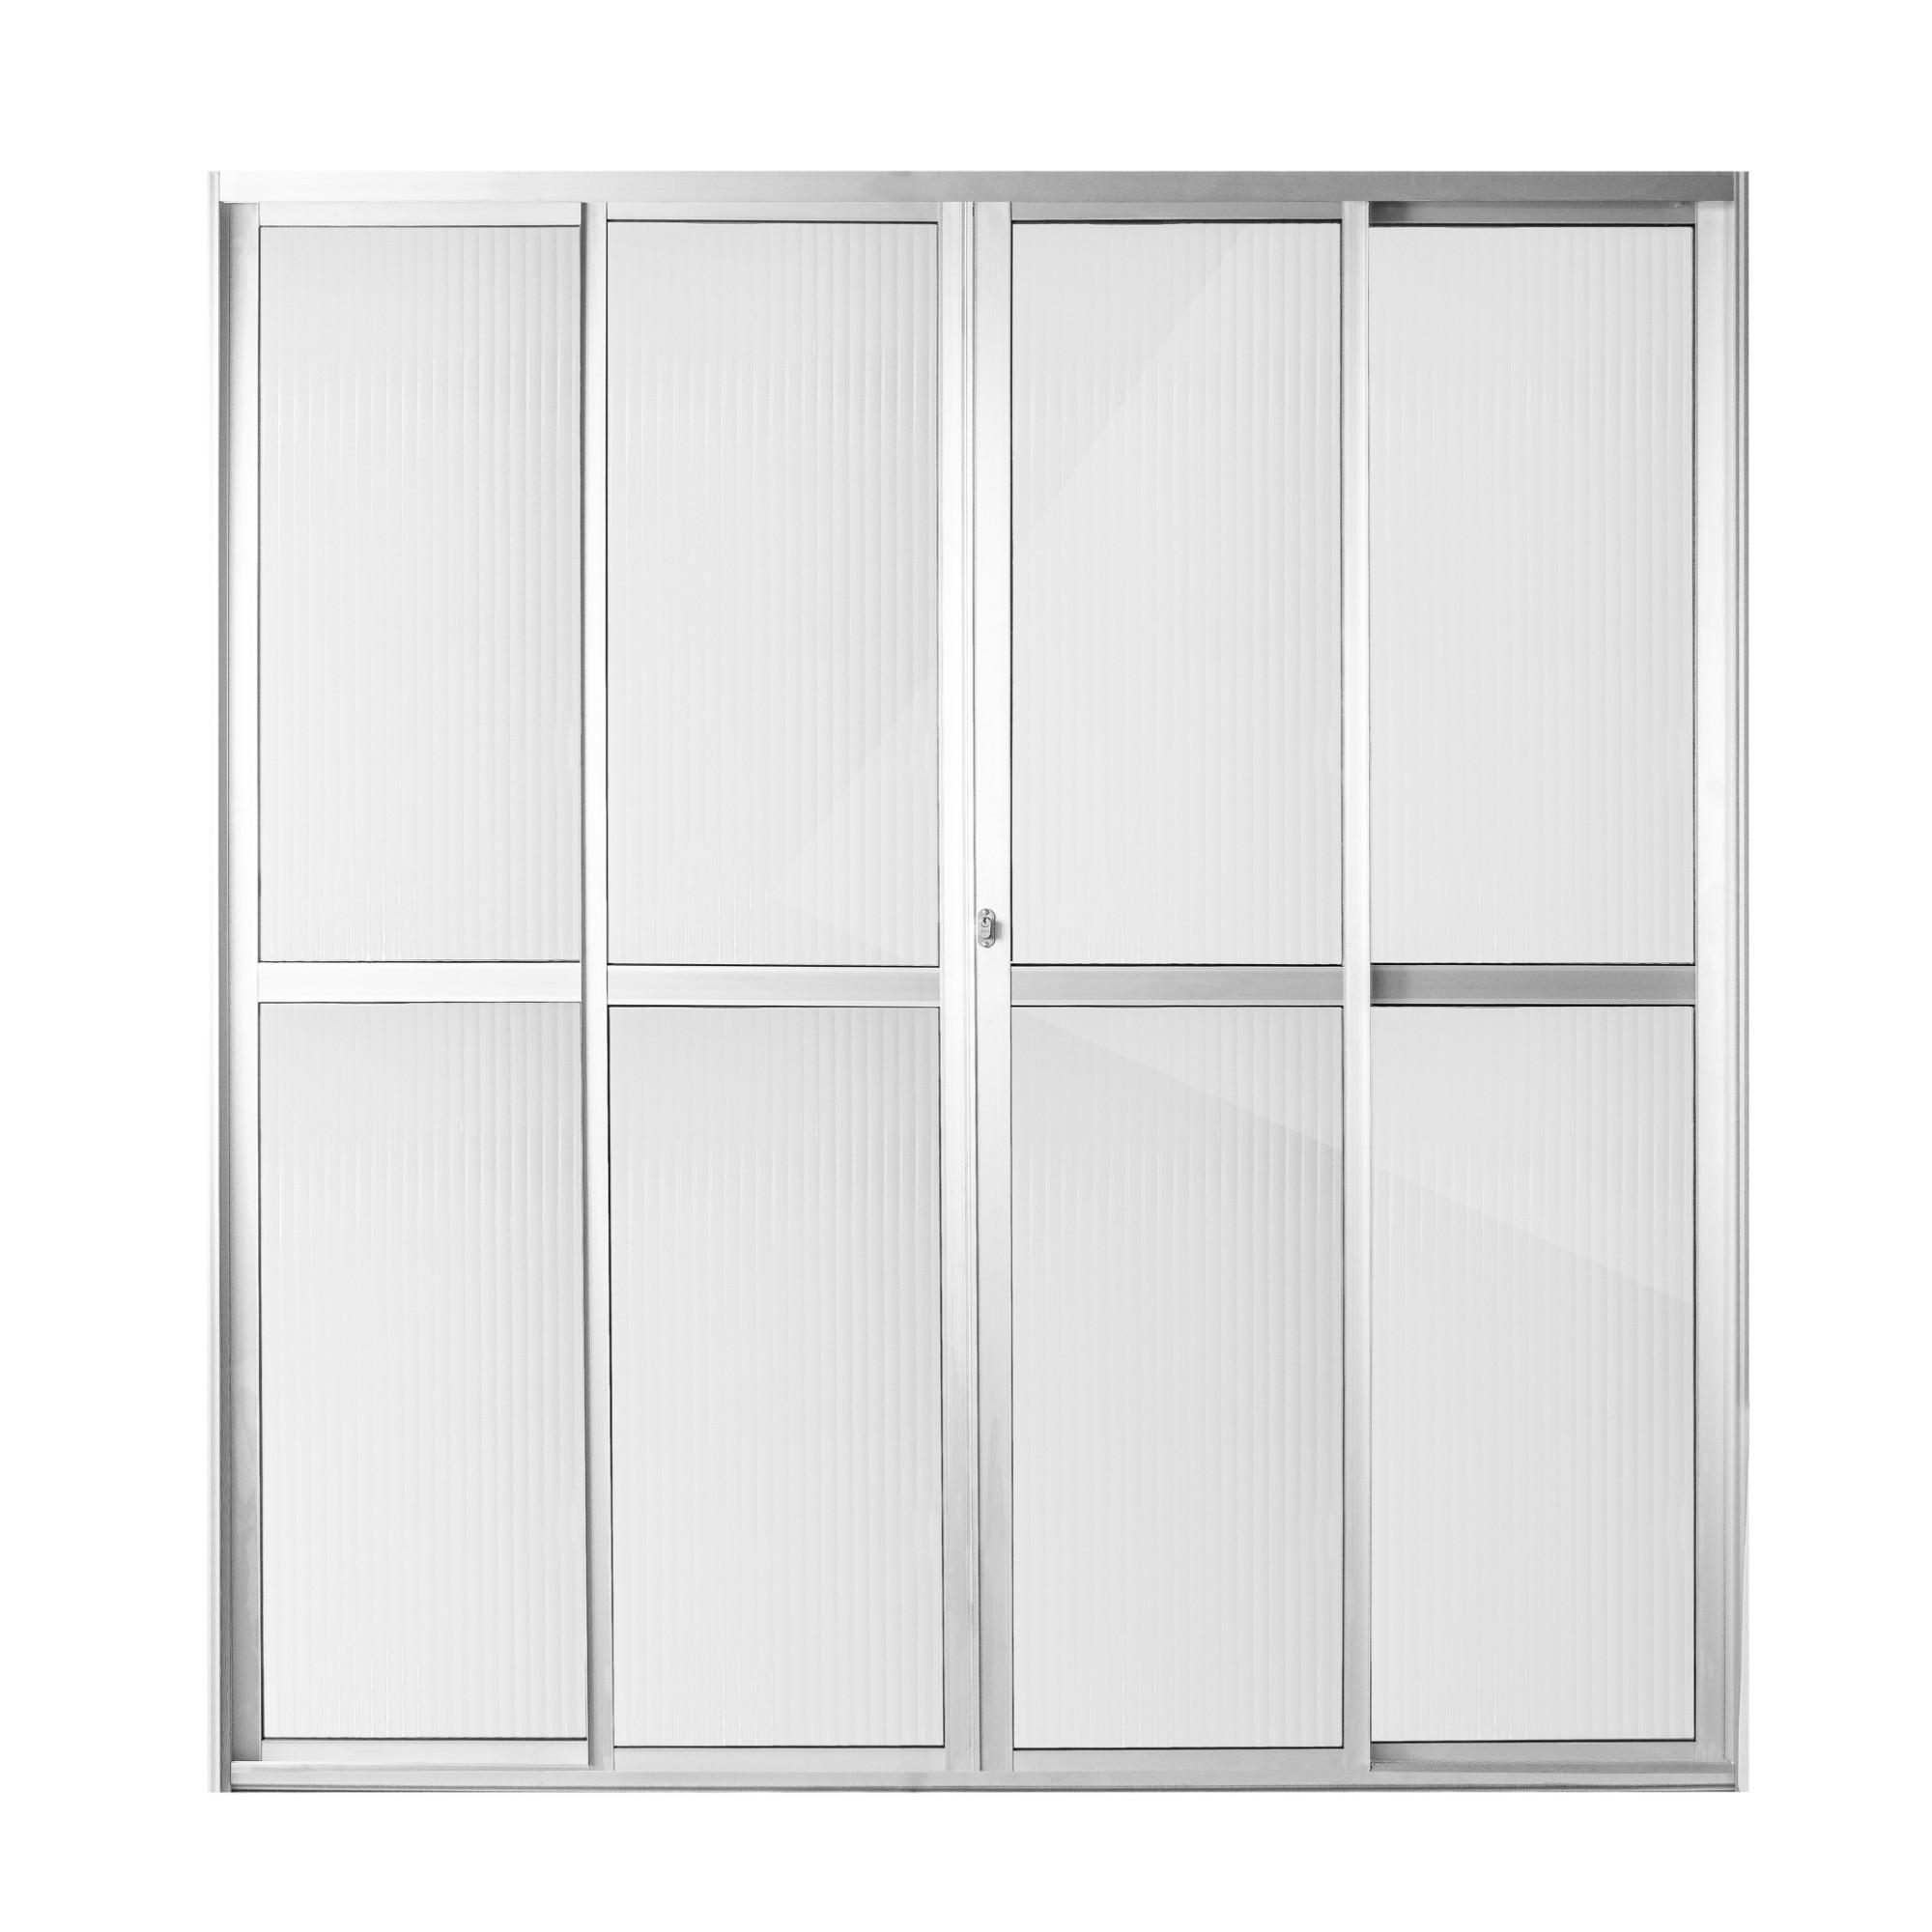 Porta Balcao de Aluminio 4 Folhas 210cm x 200cm Natural - Aluvid